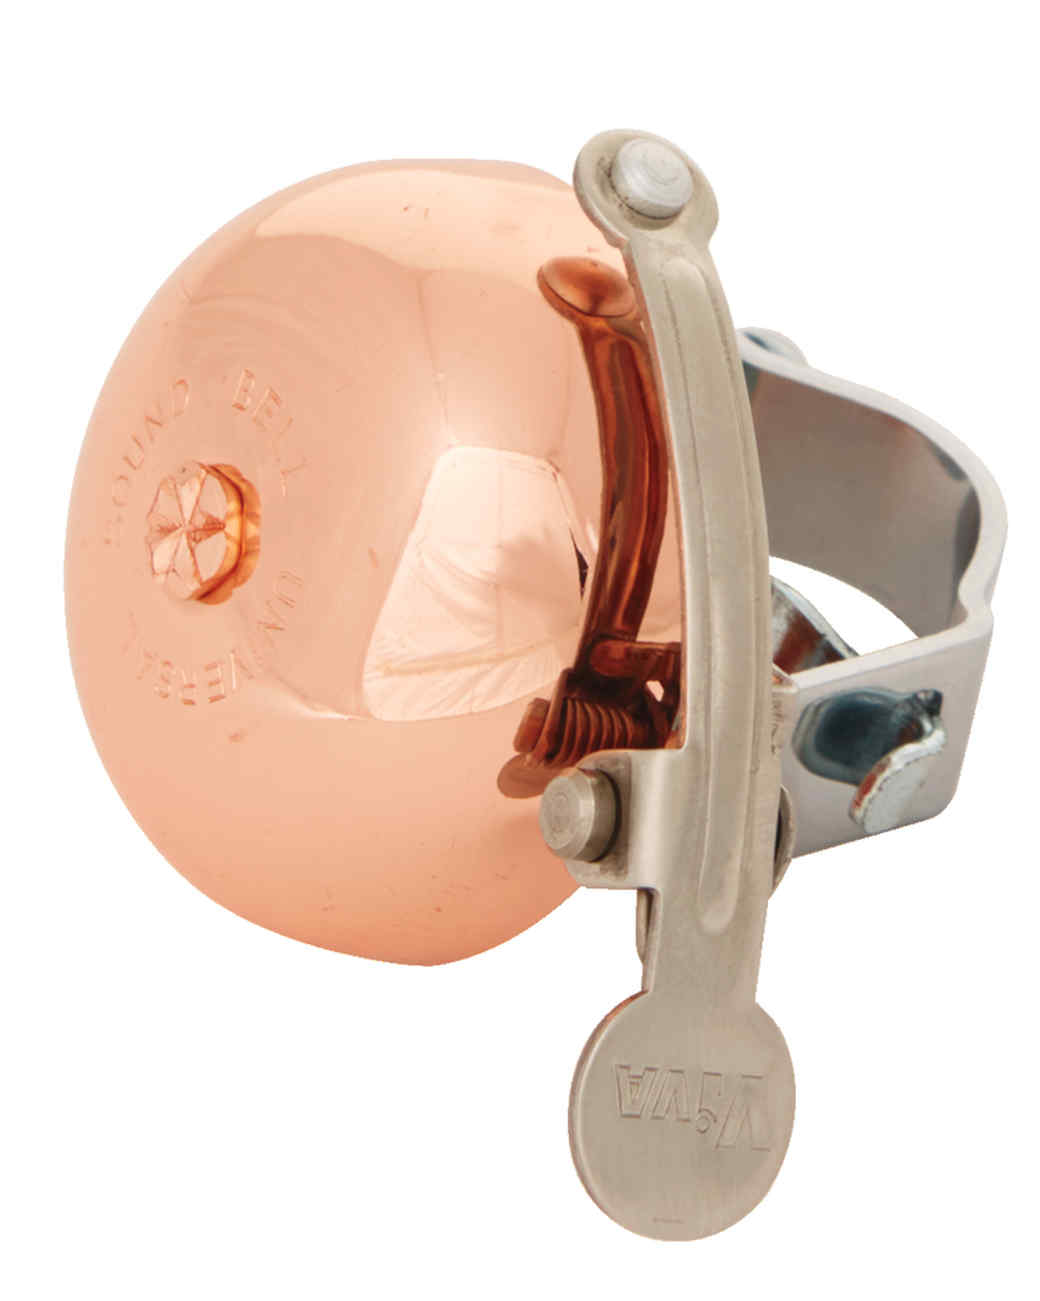 copper-bike-bell-205-d112494.jpg